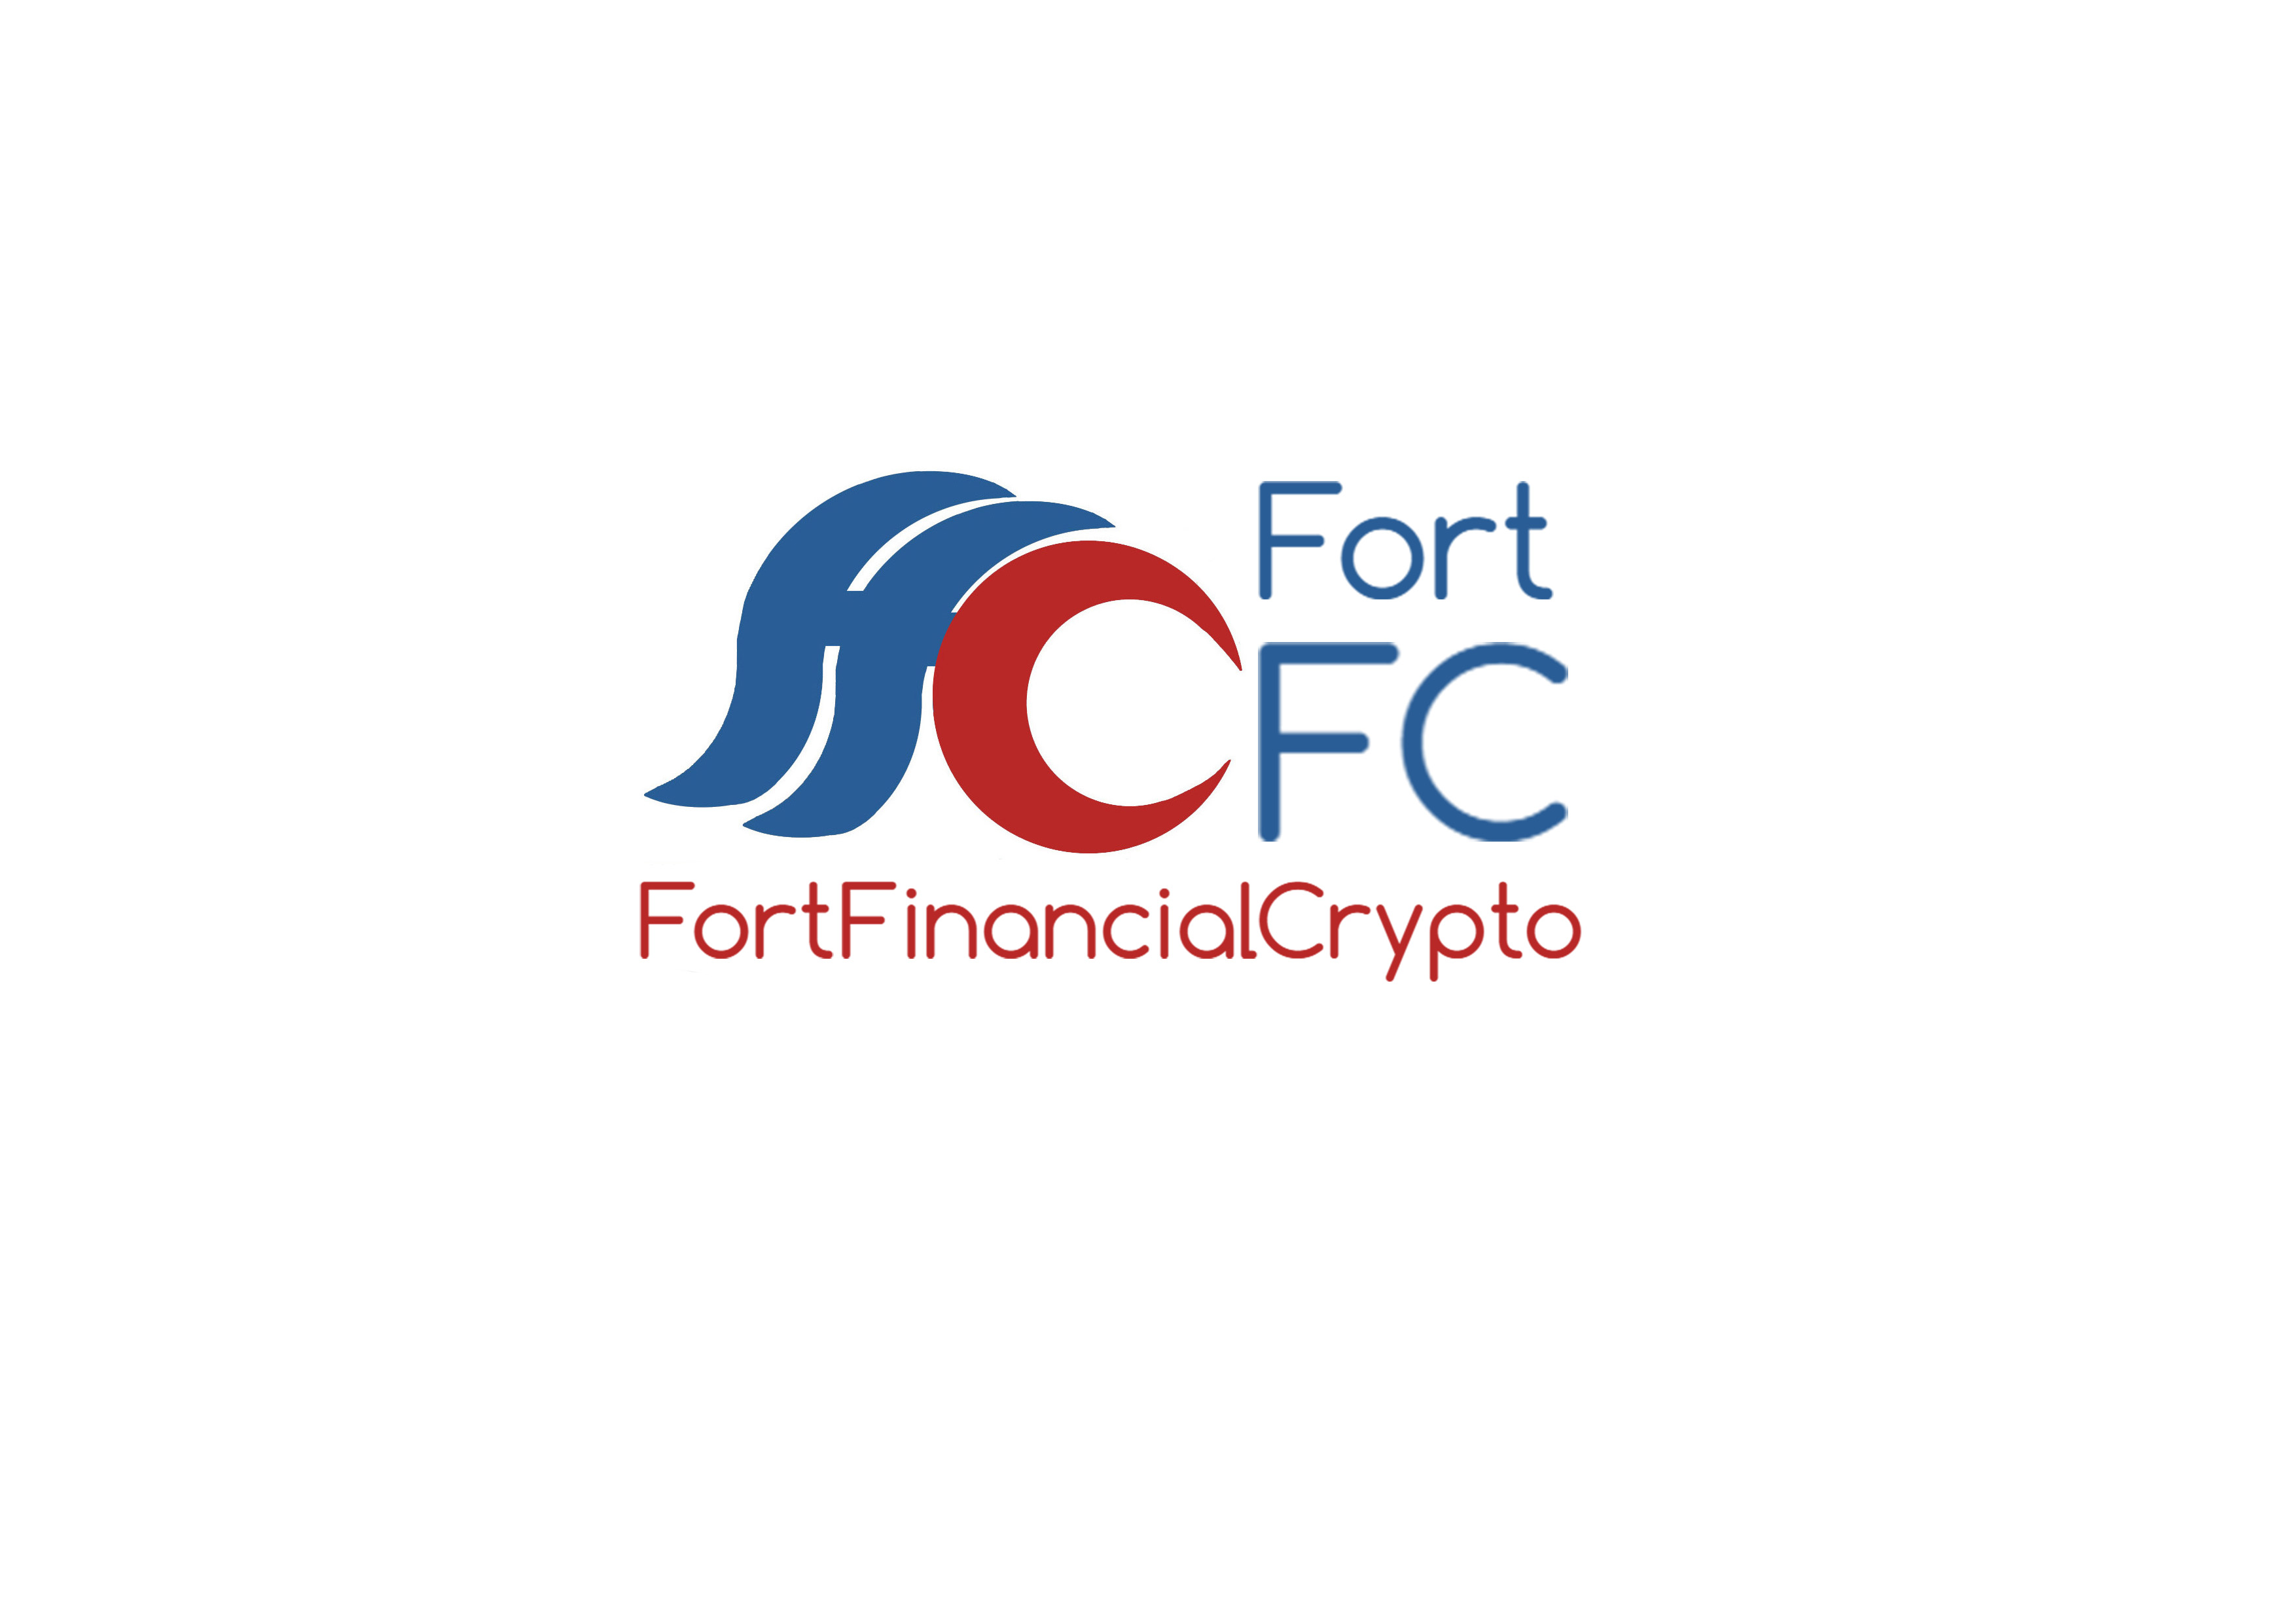 Разработка логотипа финансовой компании фото f_2305a86fb1c4f807.jpg